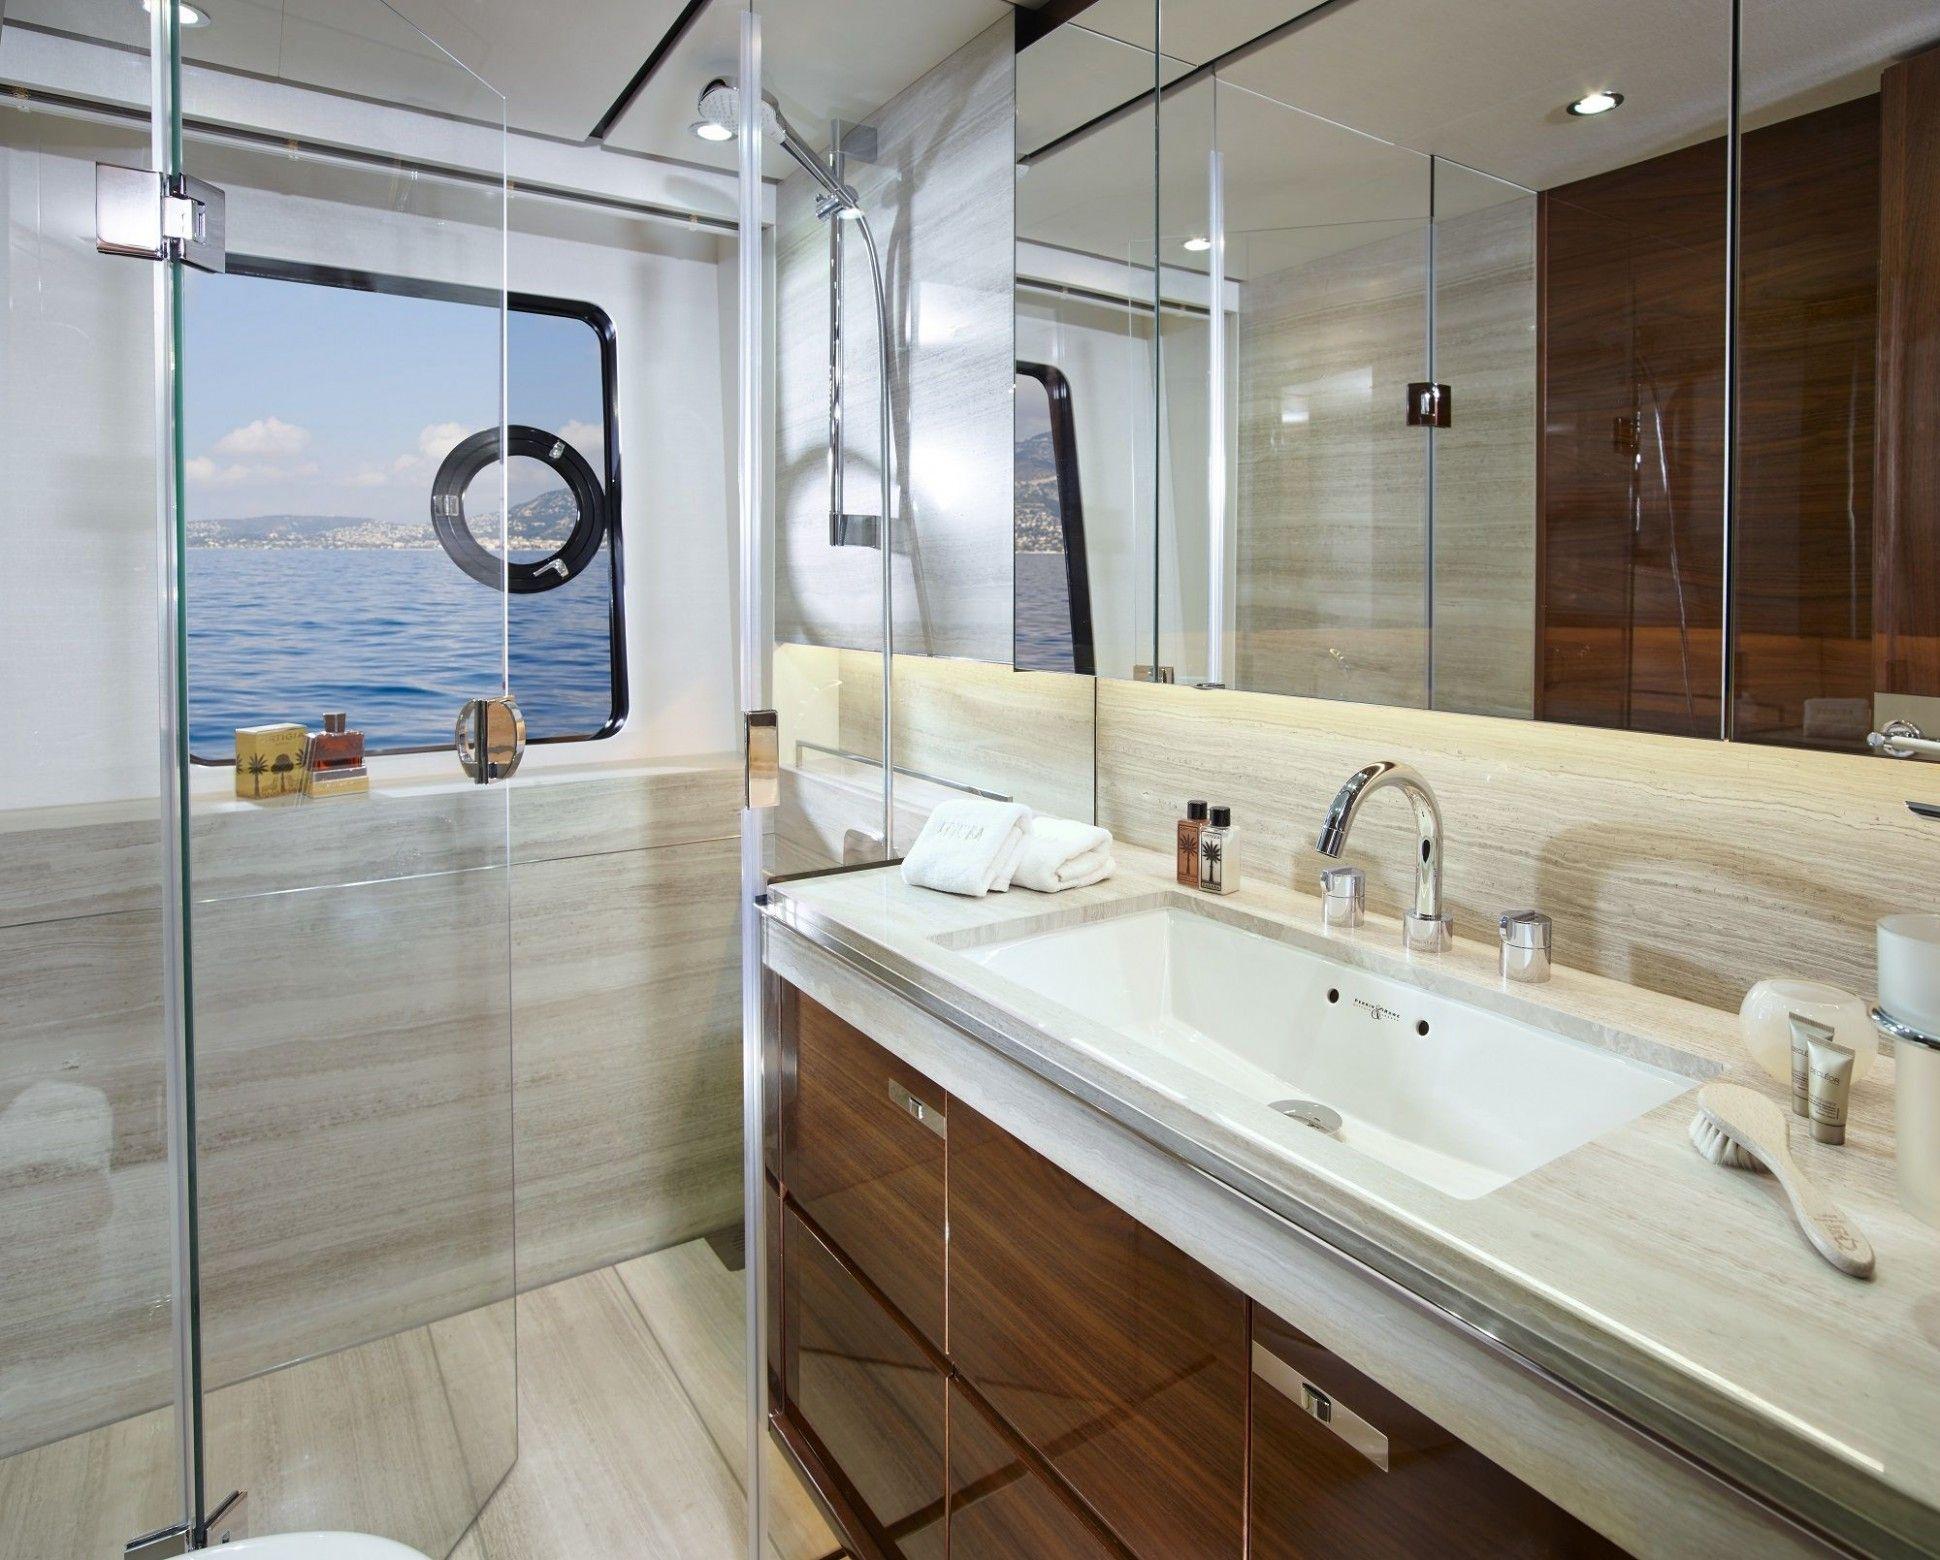 Yacht Bathroom Ideas in 7  Interior design bathroom small